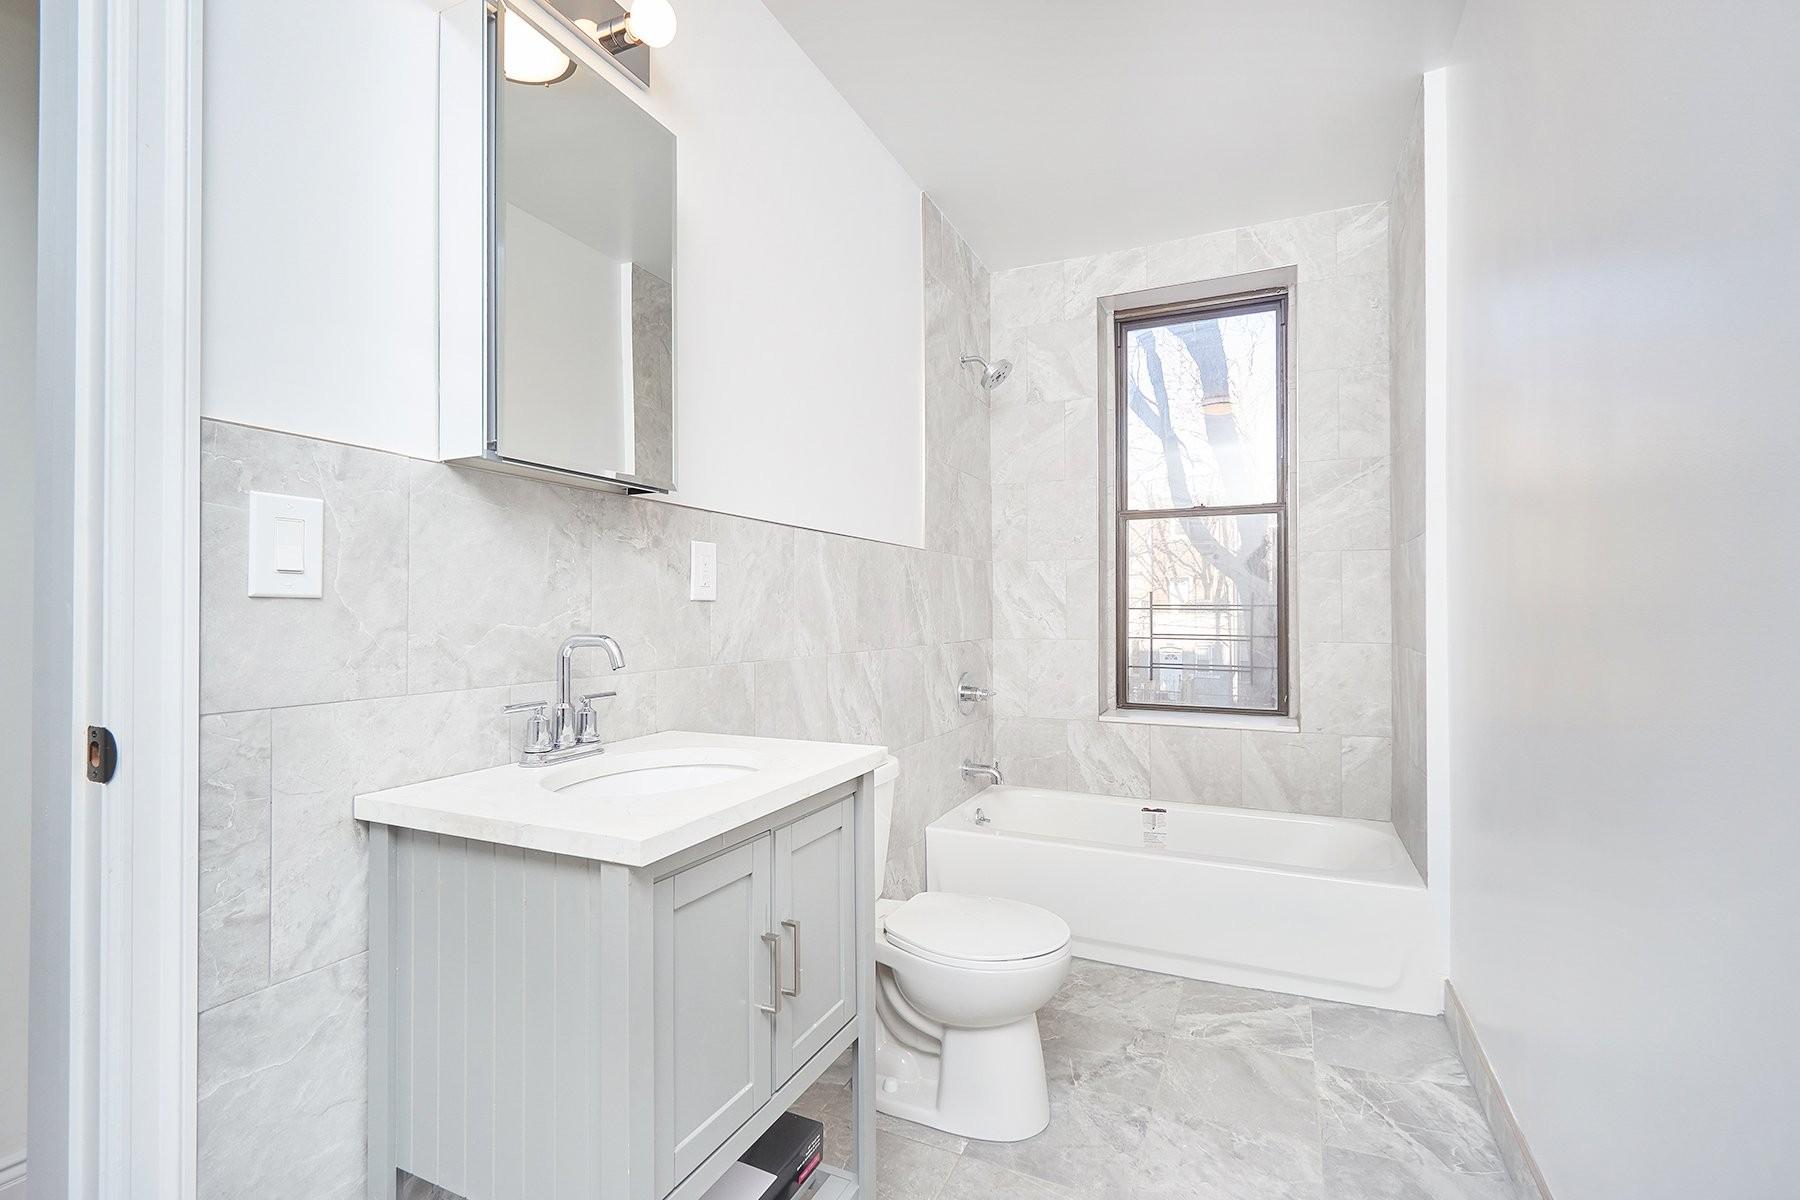 269 East 175th Street Mount Hope Bronx NY 10457